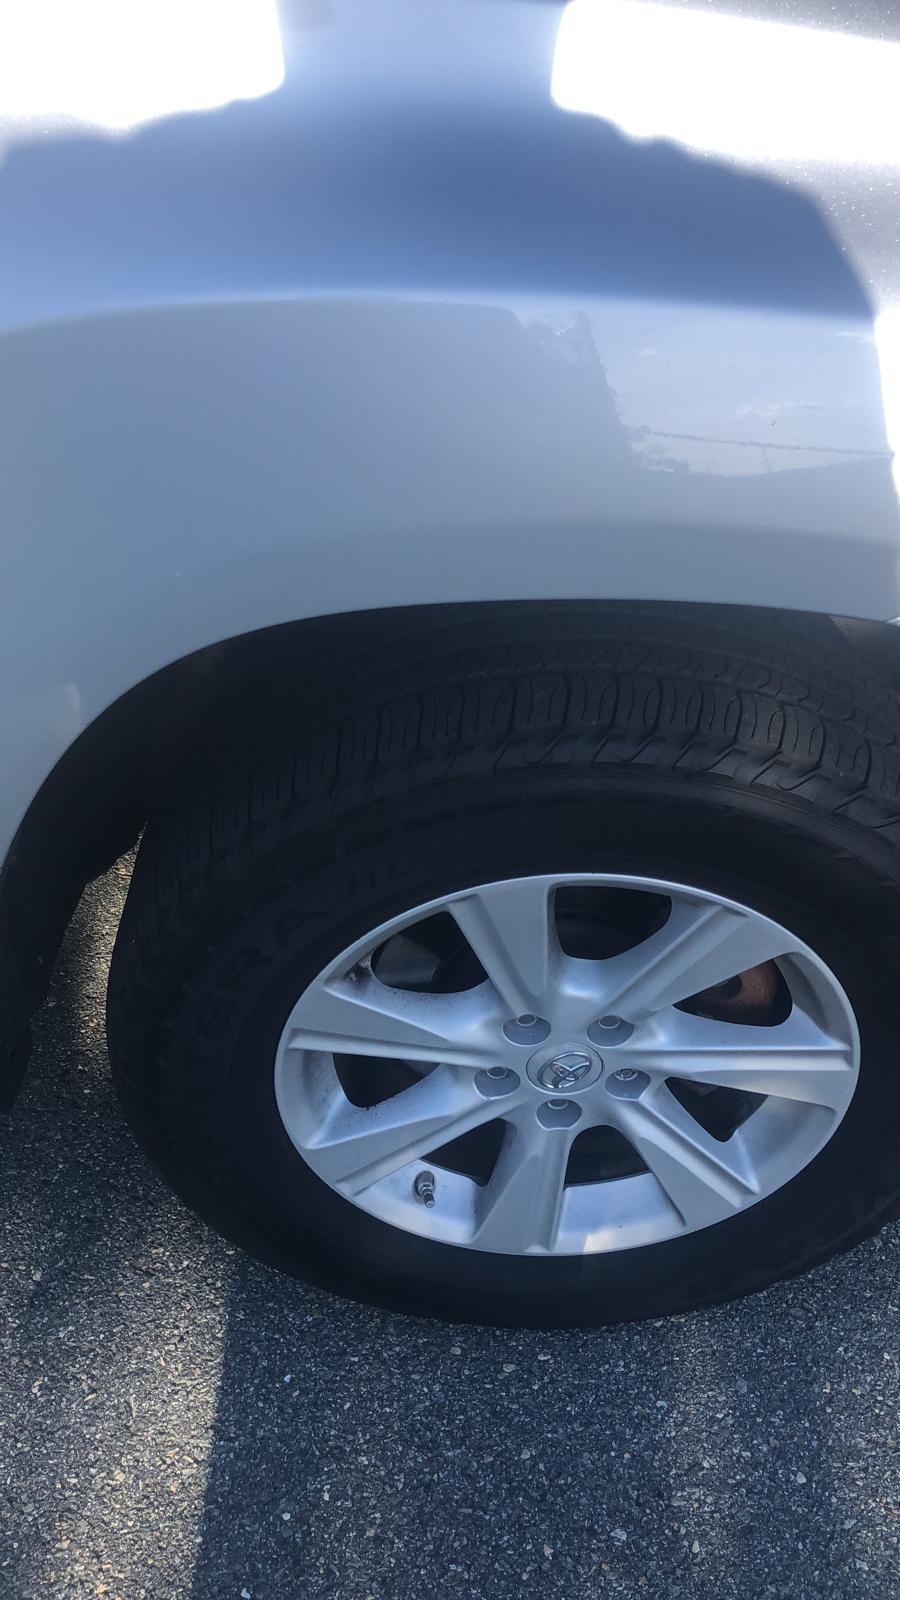 5TDBK3EH2CS164869 - 2012 Toyota Highlander 3.5L front view